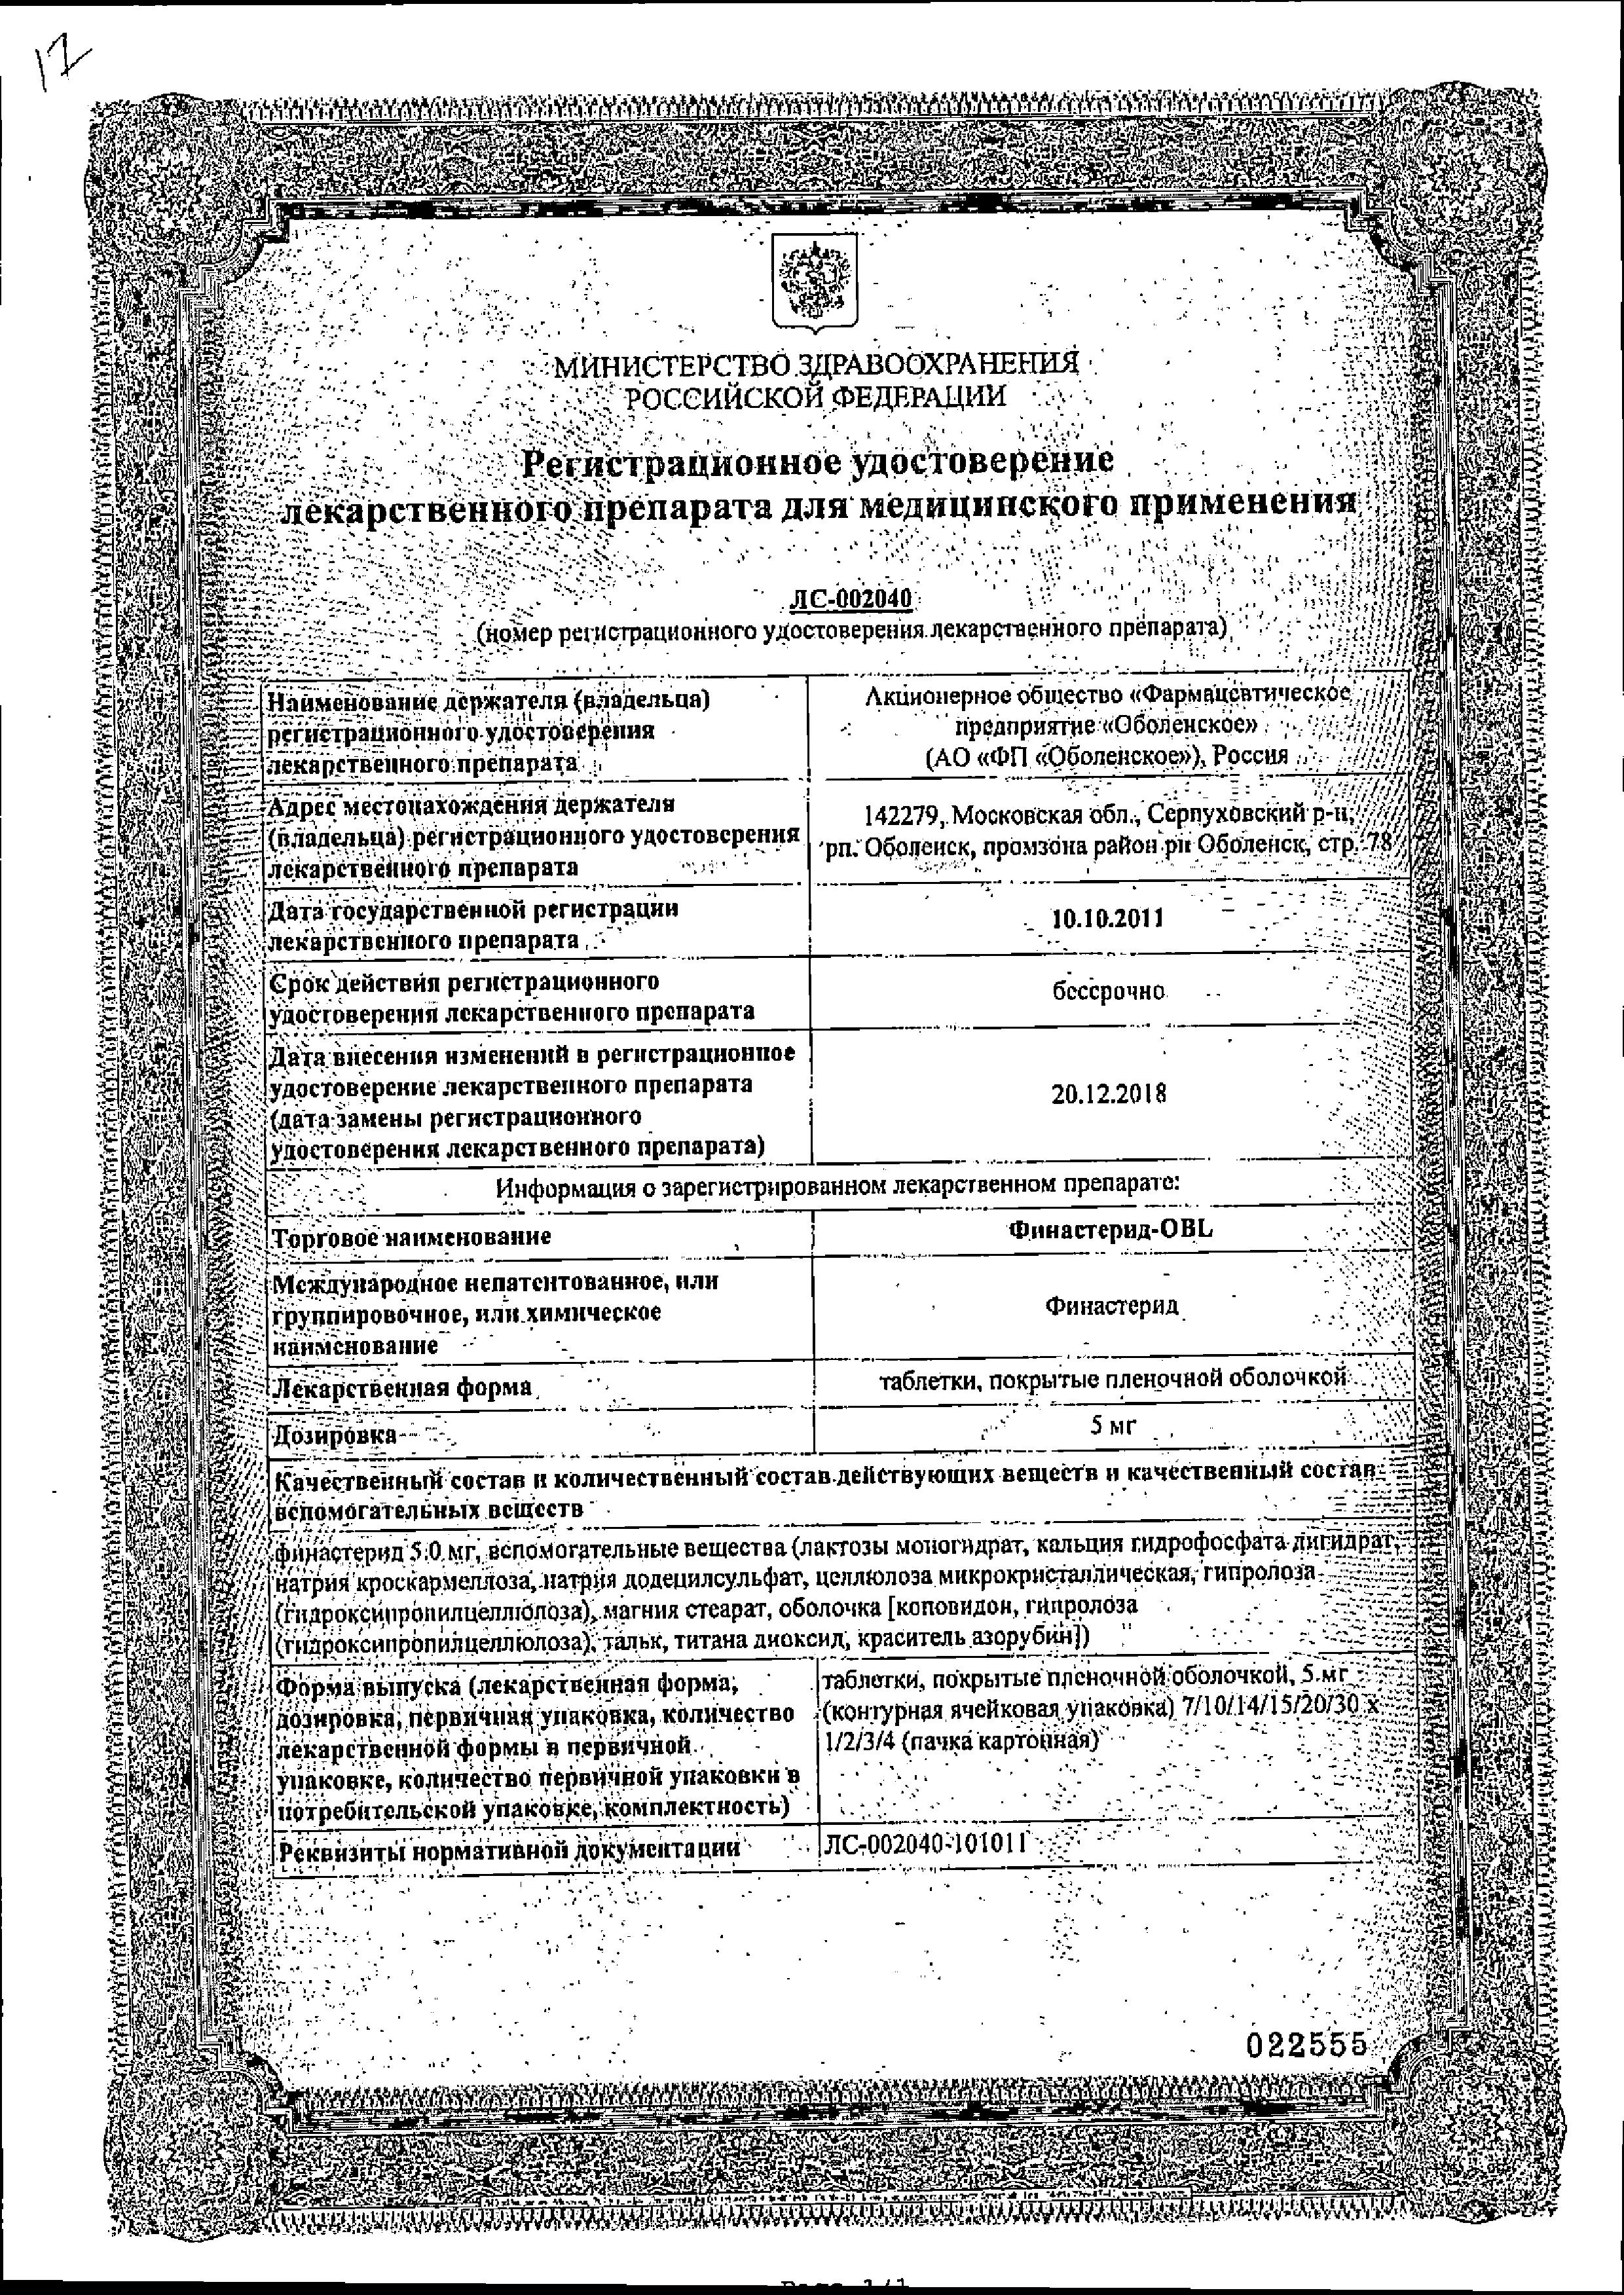 Финастерид-OBL сертификат